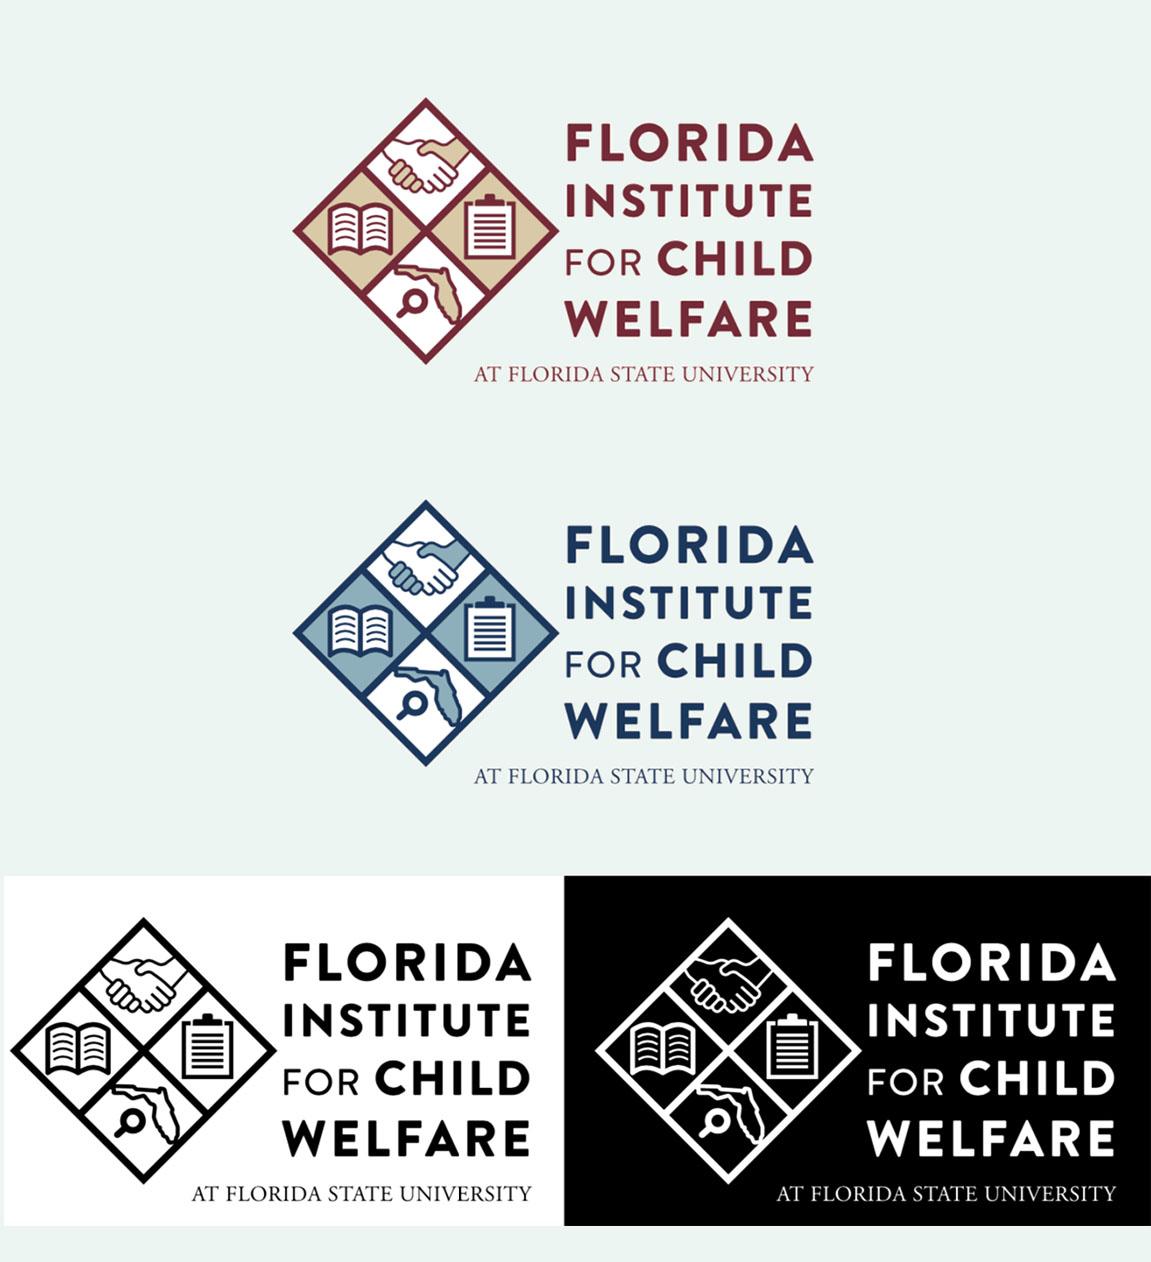 Florida Institute for Child Welfare